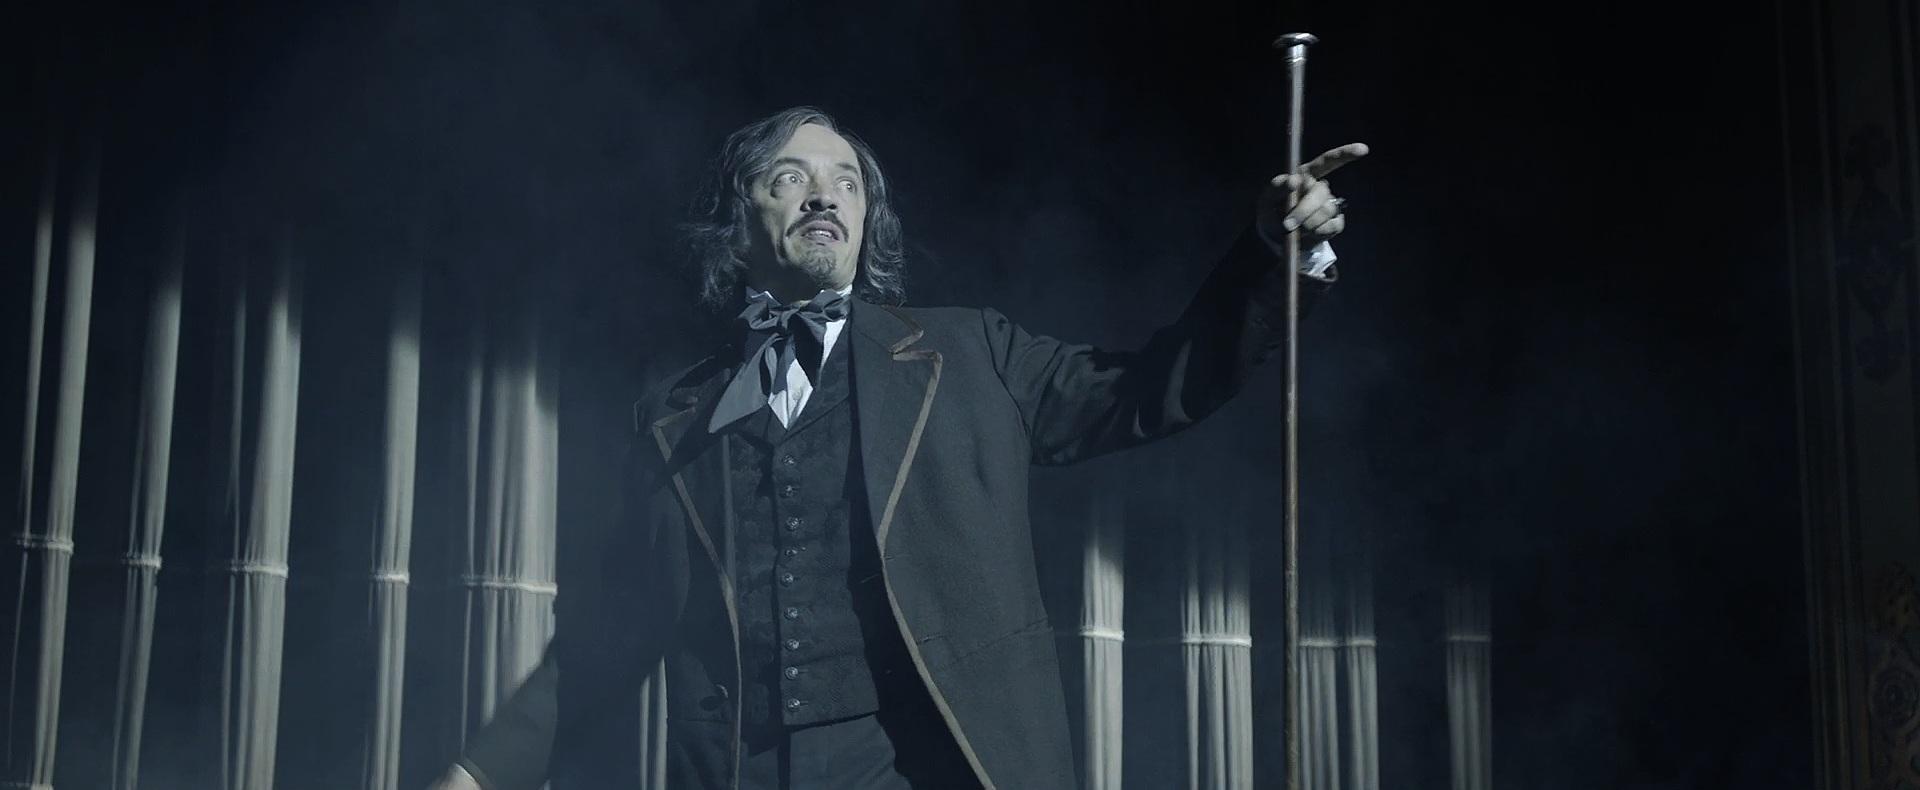 Pedro Lacerda in Os Maias: Cenas da Vida Romântica (2014)